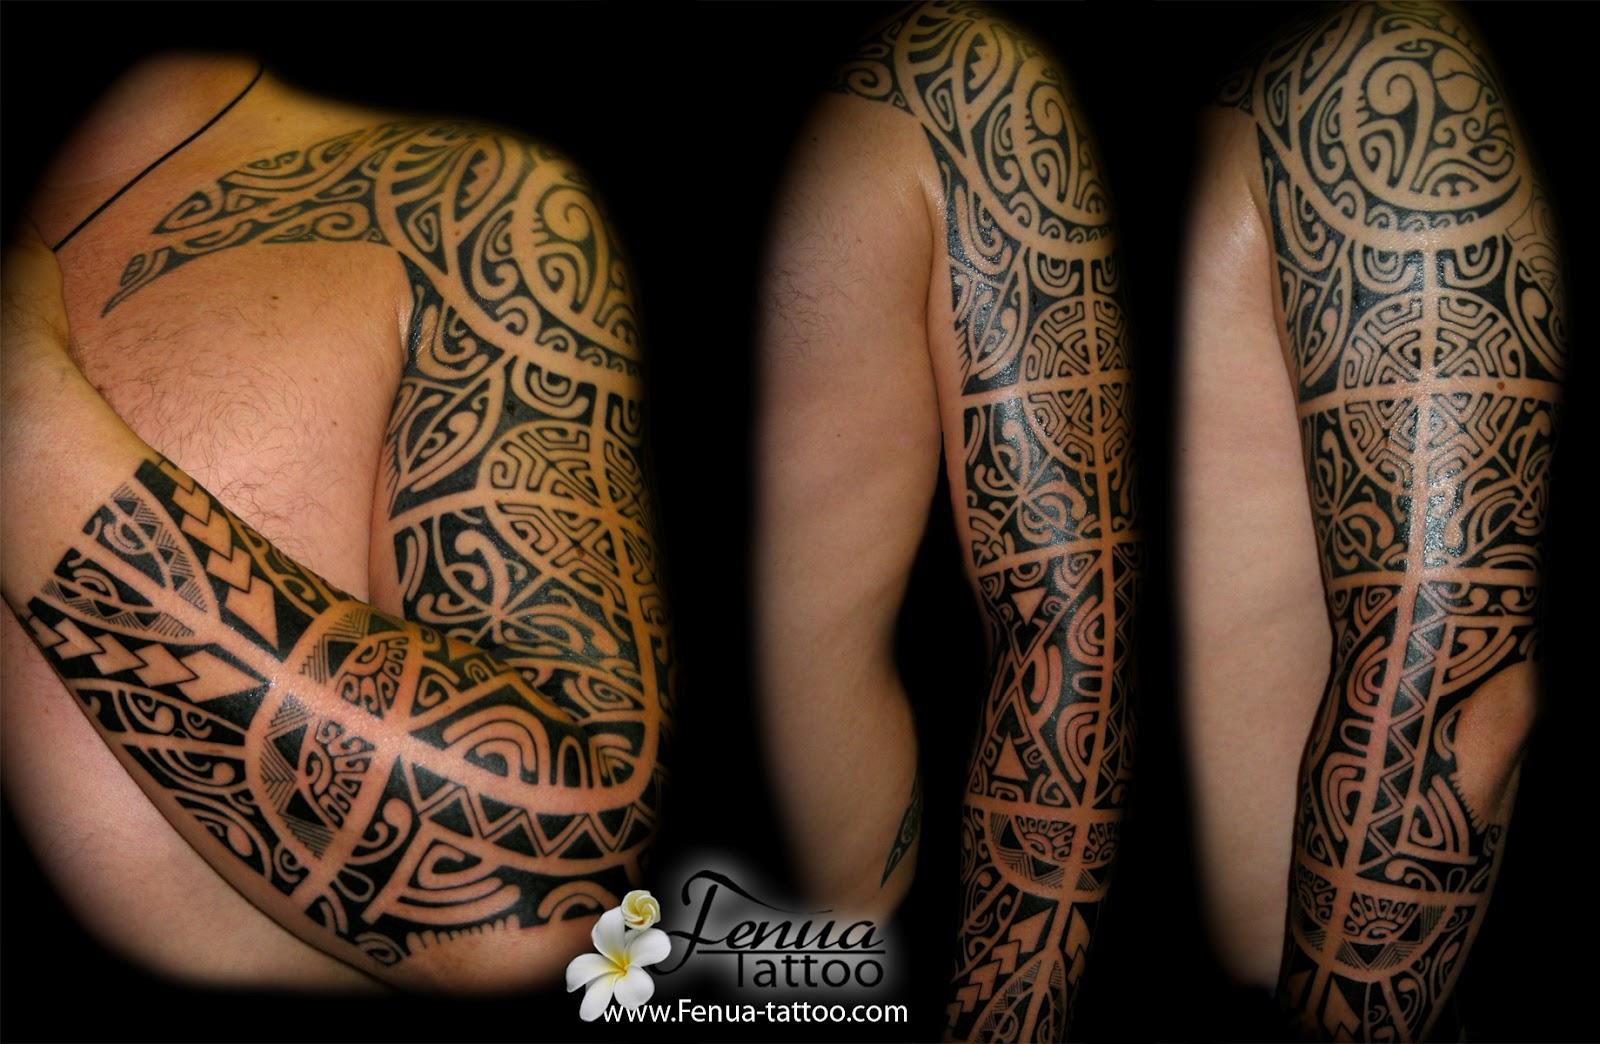 tahiti tattoo sp cialiste du tatouage polynesien dot work. Black Bedroom Furniture Sets. Home Design Ideas